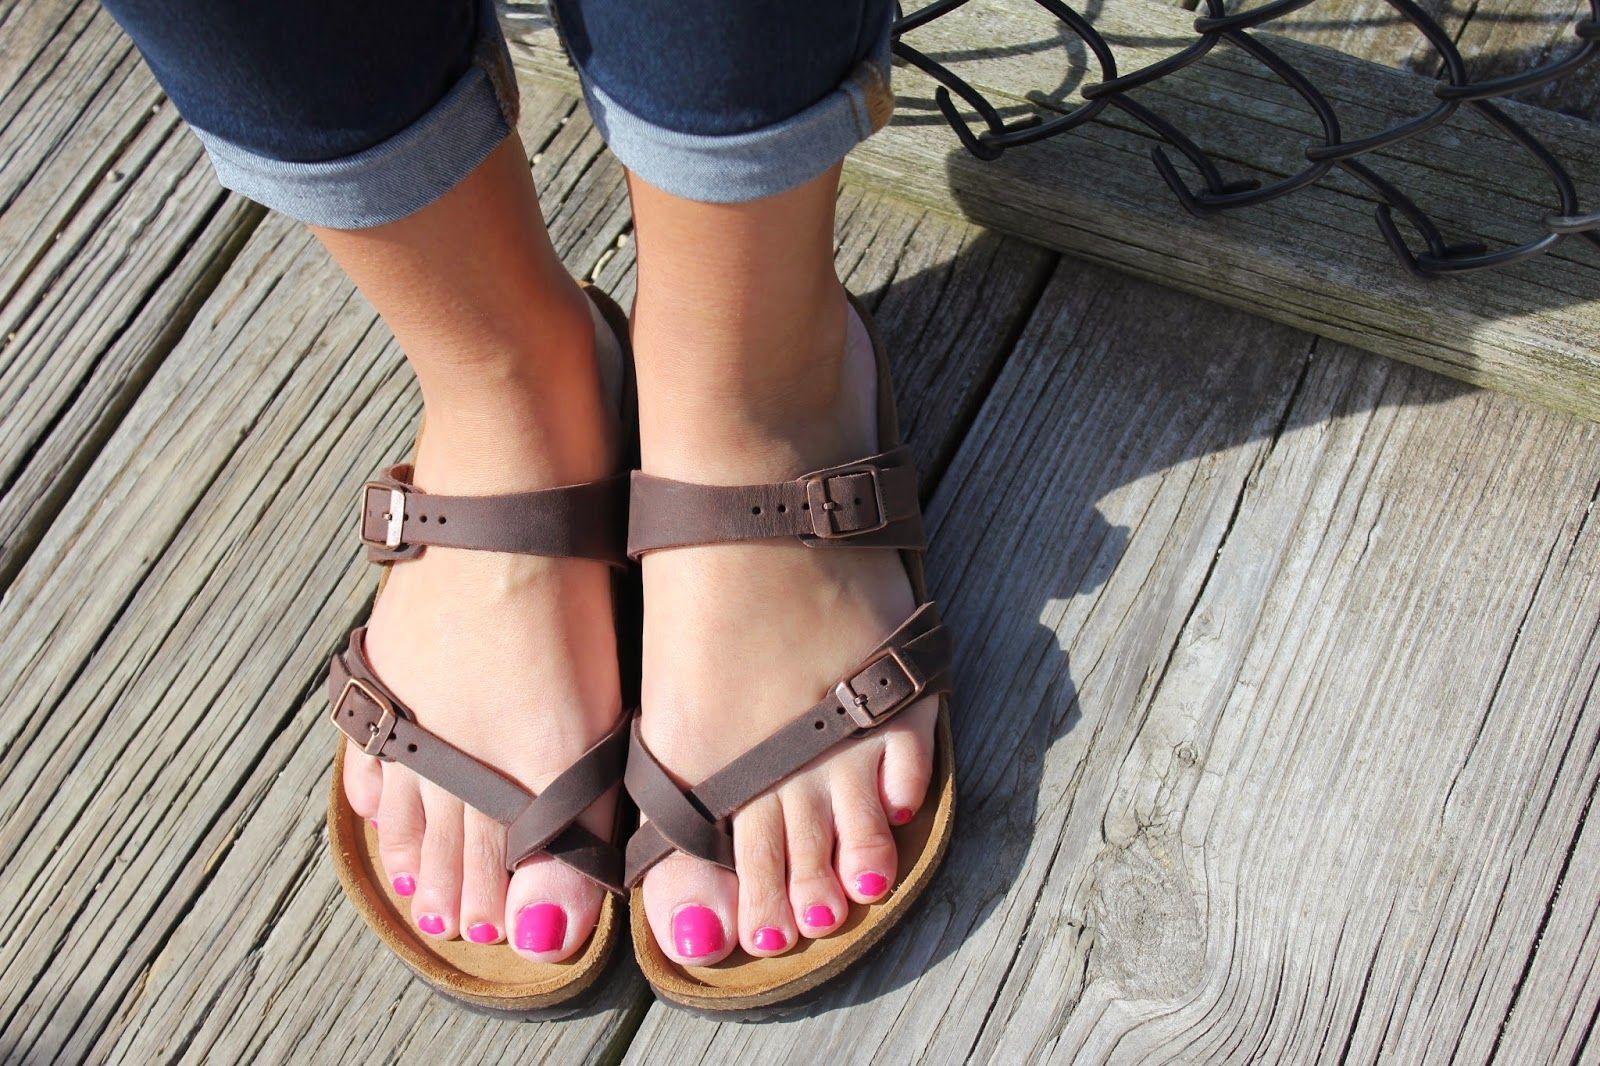 7aed44148cdb Birkenstocks Mayari Habana Oiled Leather Sandals Anchors and Pearls ...